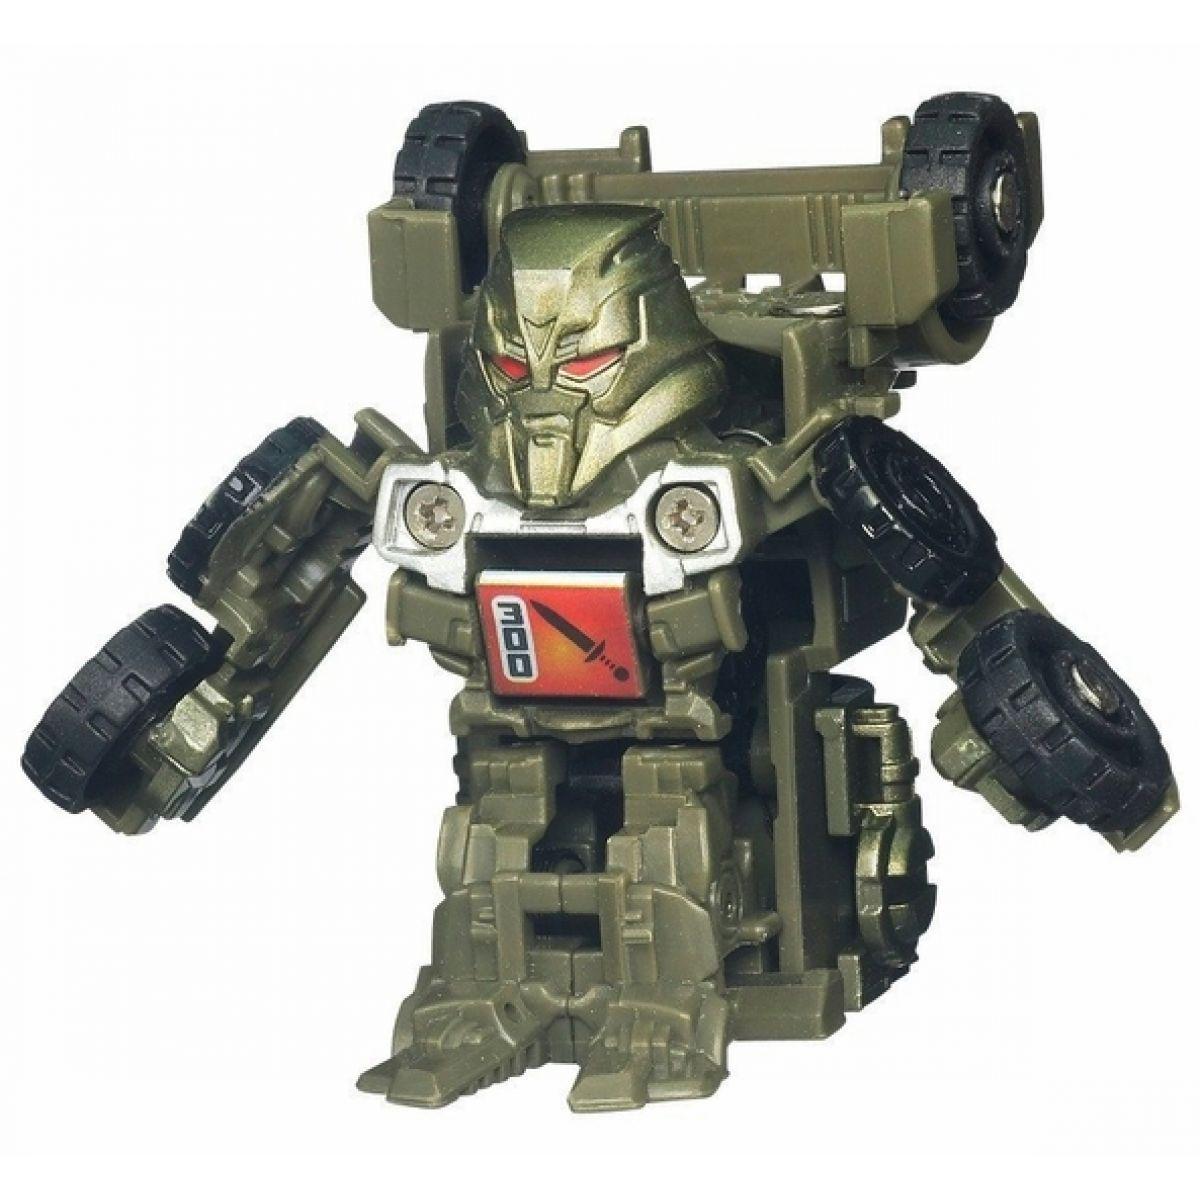 Transformers BOT SHOTS Hasbro - B018 Megatron